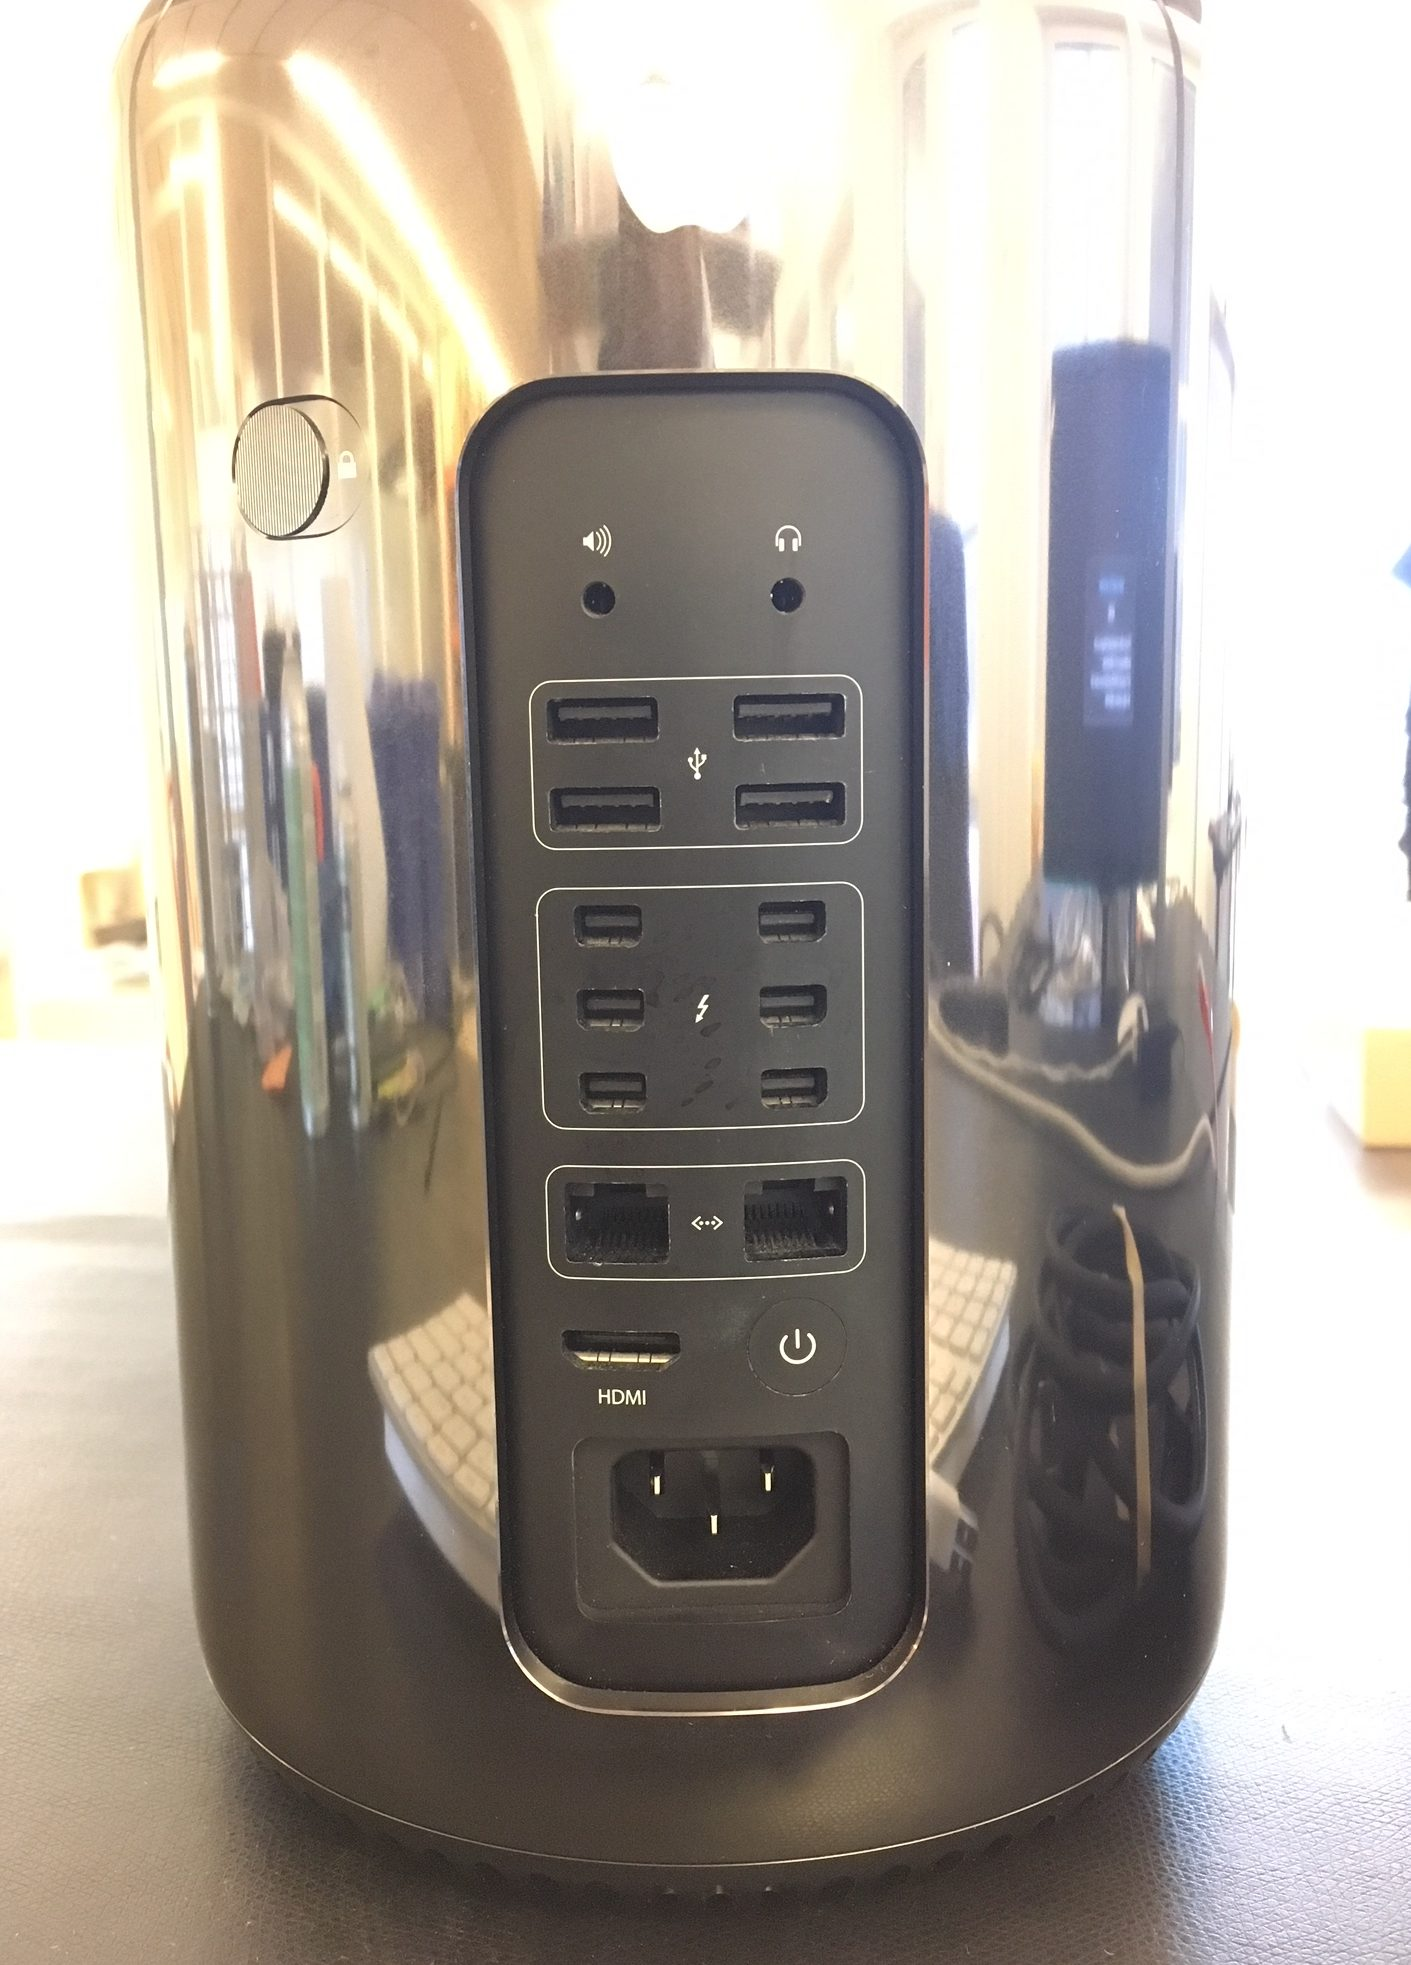 Mac Pro Late 2013 (Intel 6-Core Xeon 3.5 GHz 16 GB RAM 256 GB SSD), Intel Xeon E5, 3.5 GHz (Ivy Bridge), 16 GB (1866 MHz), 256 GB Flash, bild 2